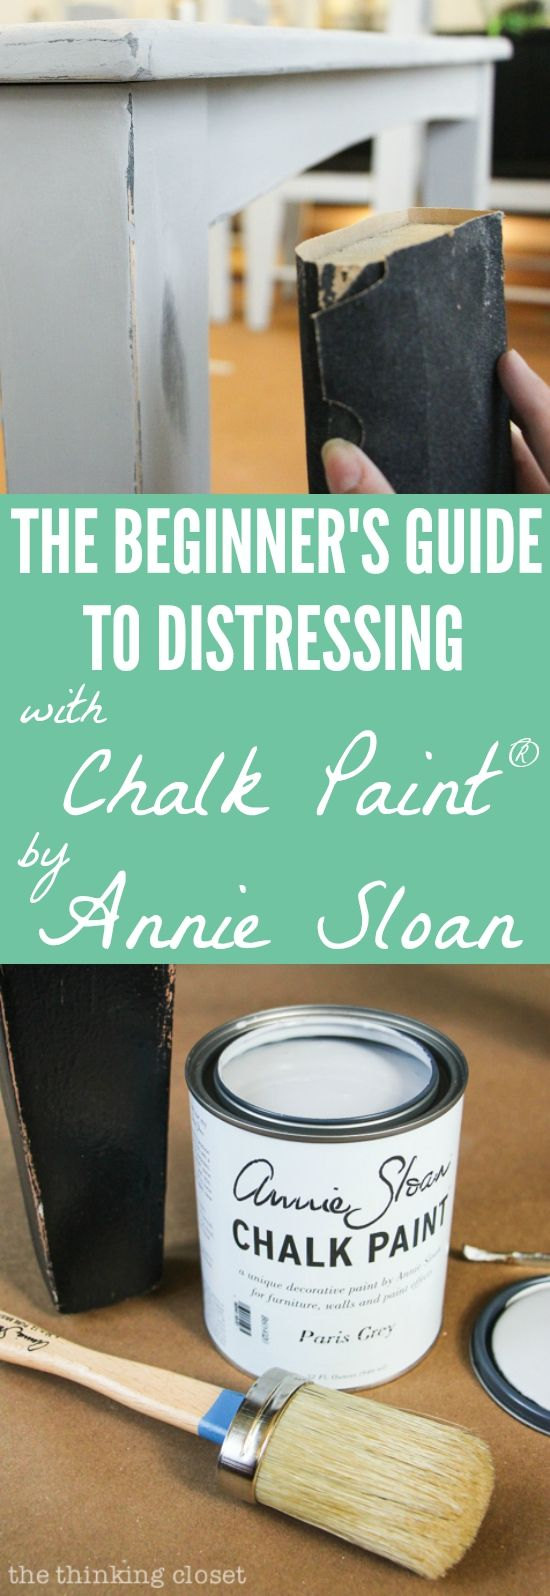 The Beginner S Guide To Distressing With Chalk Paint By Annie Sloan Muebles Pintados De Tiza Cera Para Muebles Y Trucos De Pintura